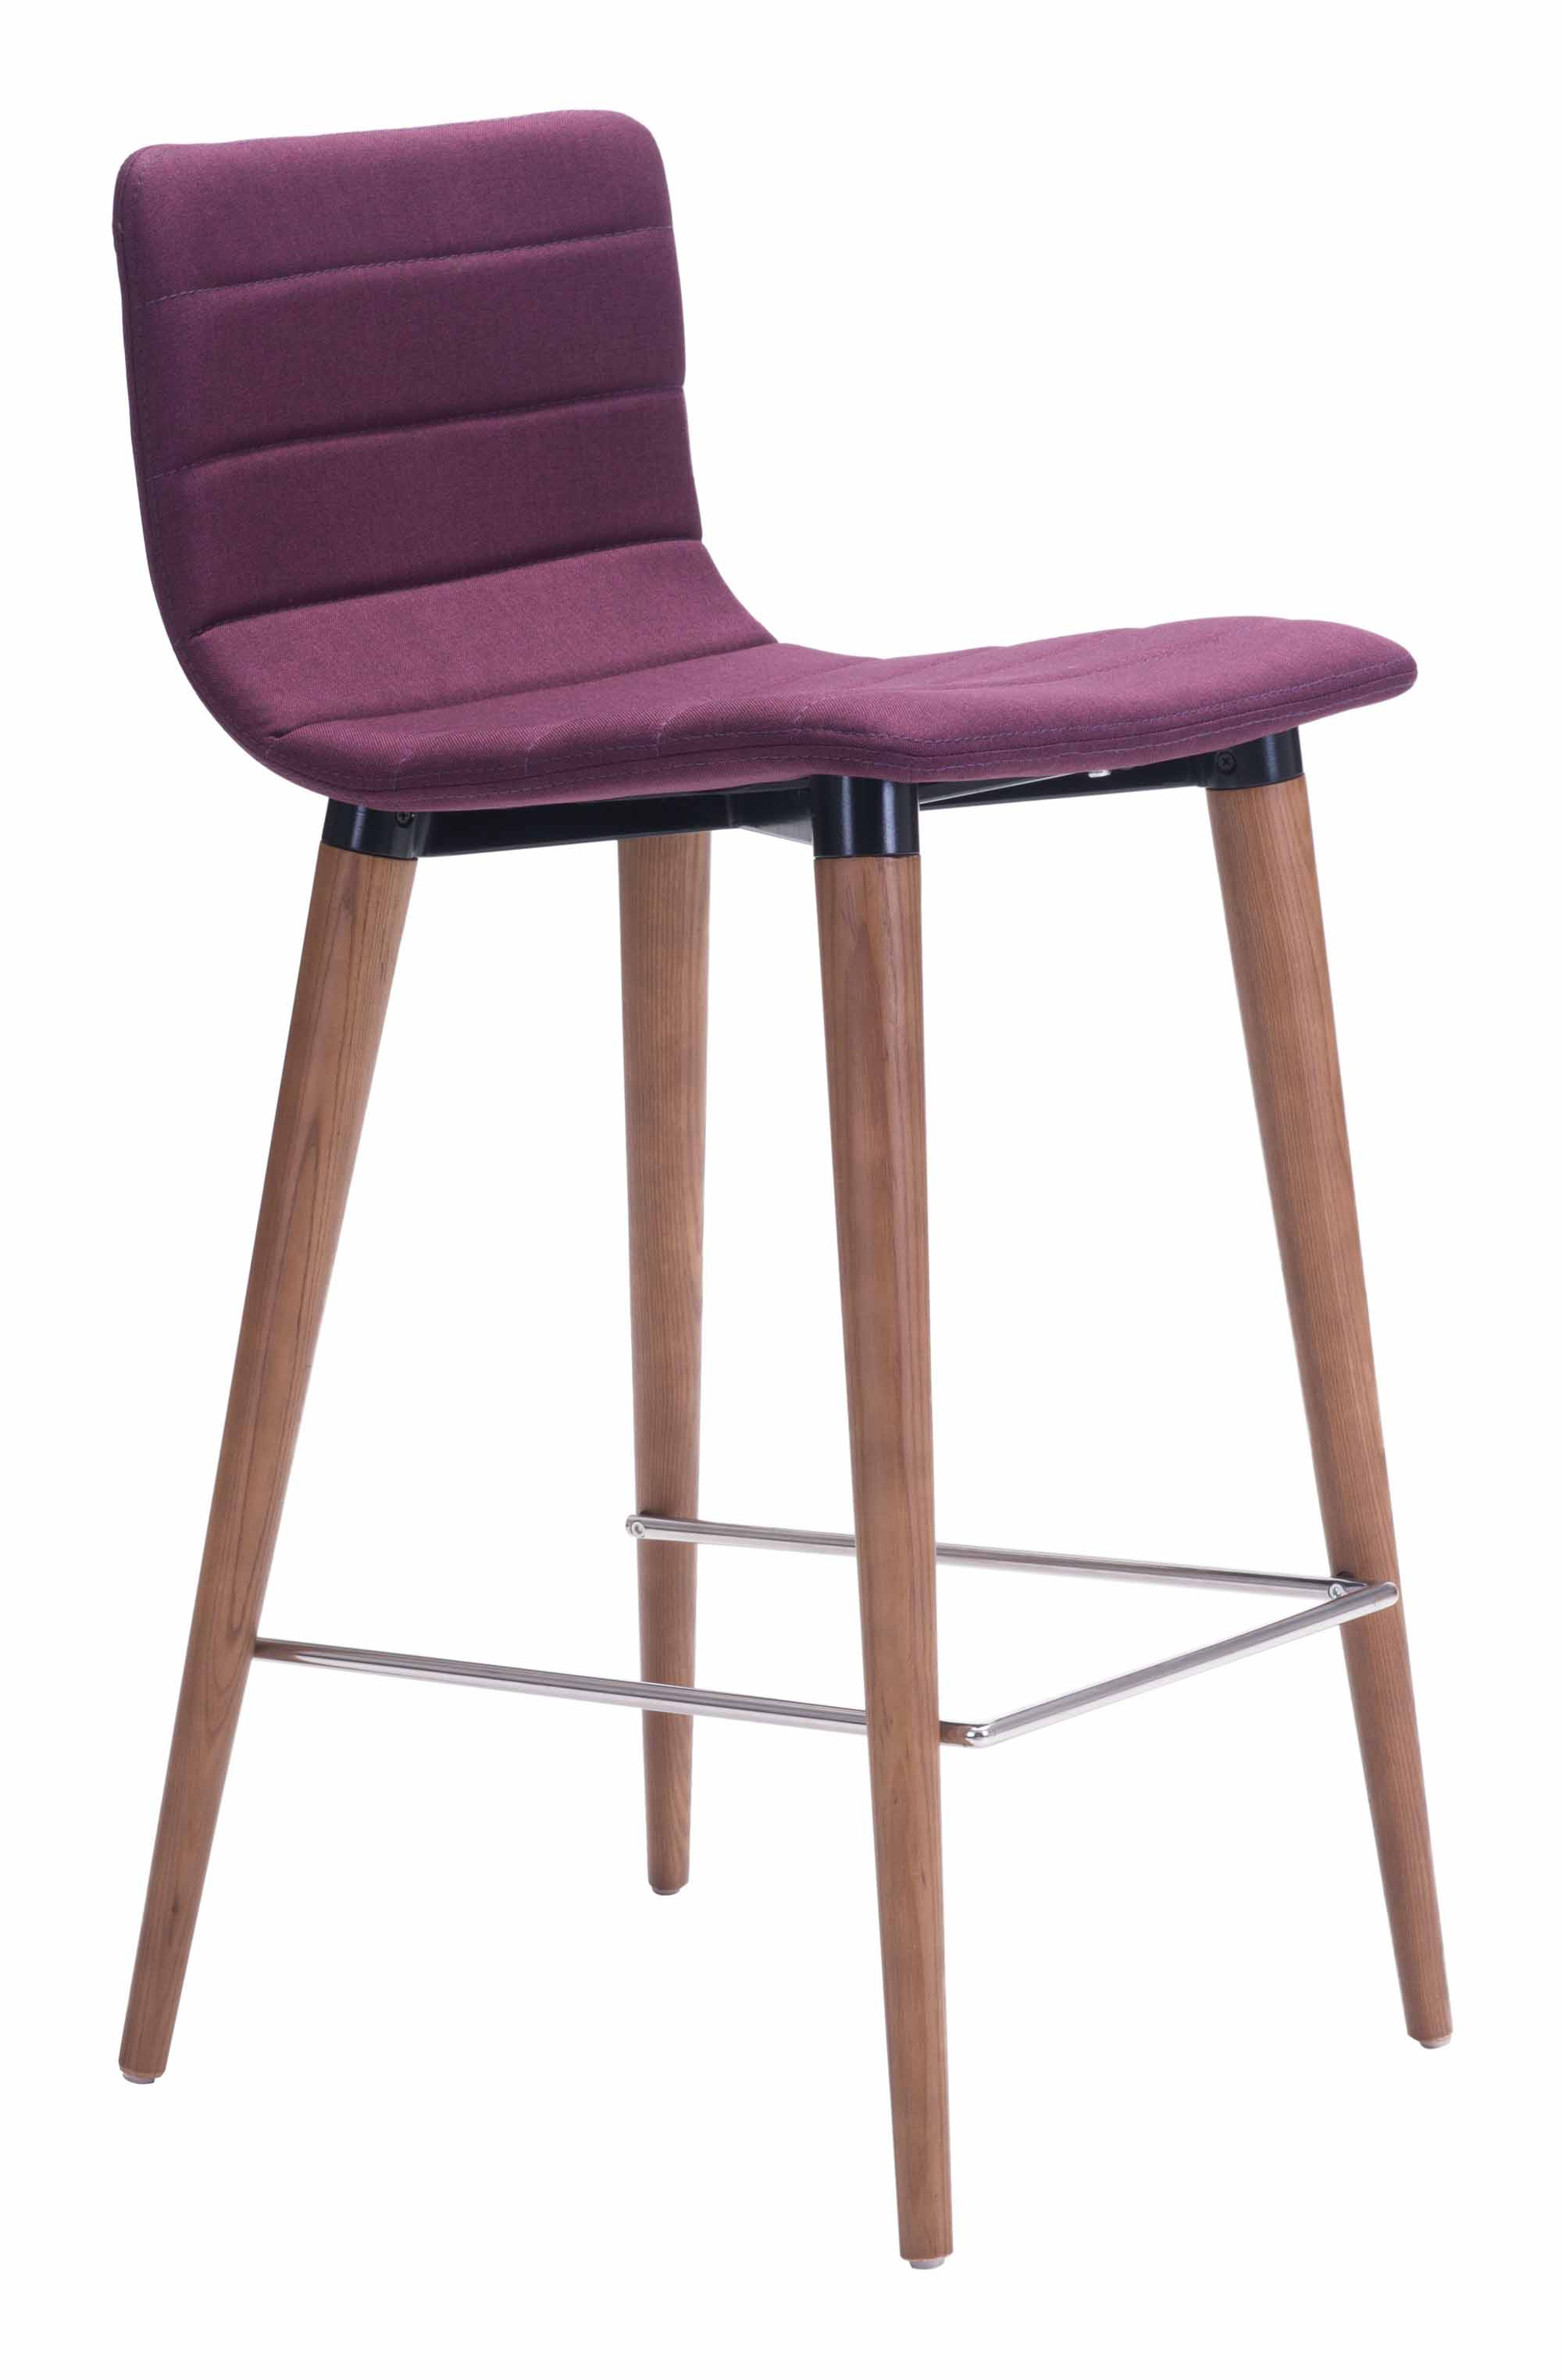 Amazing Jericho Counter Chair Purple Set Of 2 By Zuo Modern Uwap Interior Chair Design Uwaporg